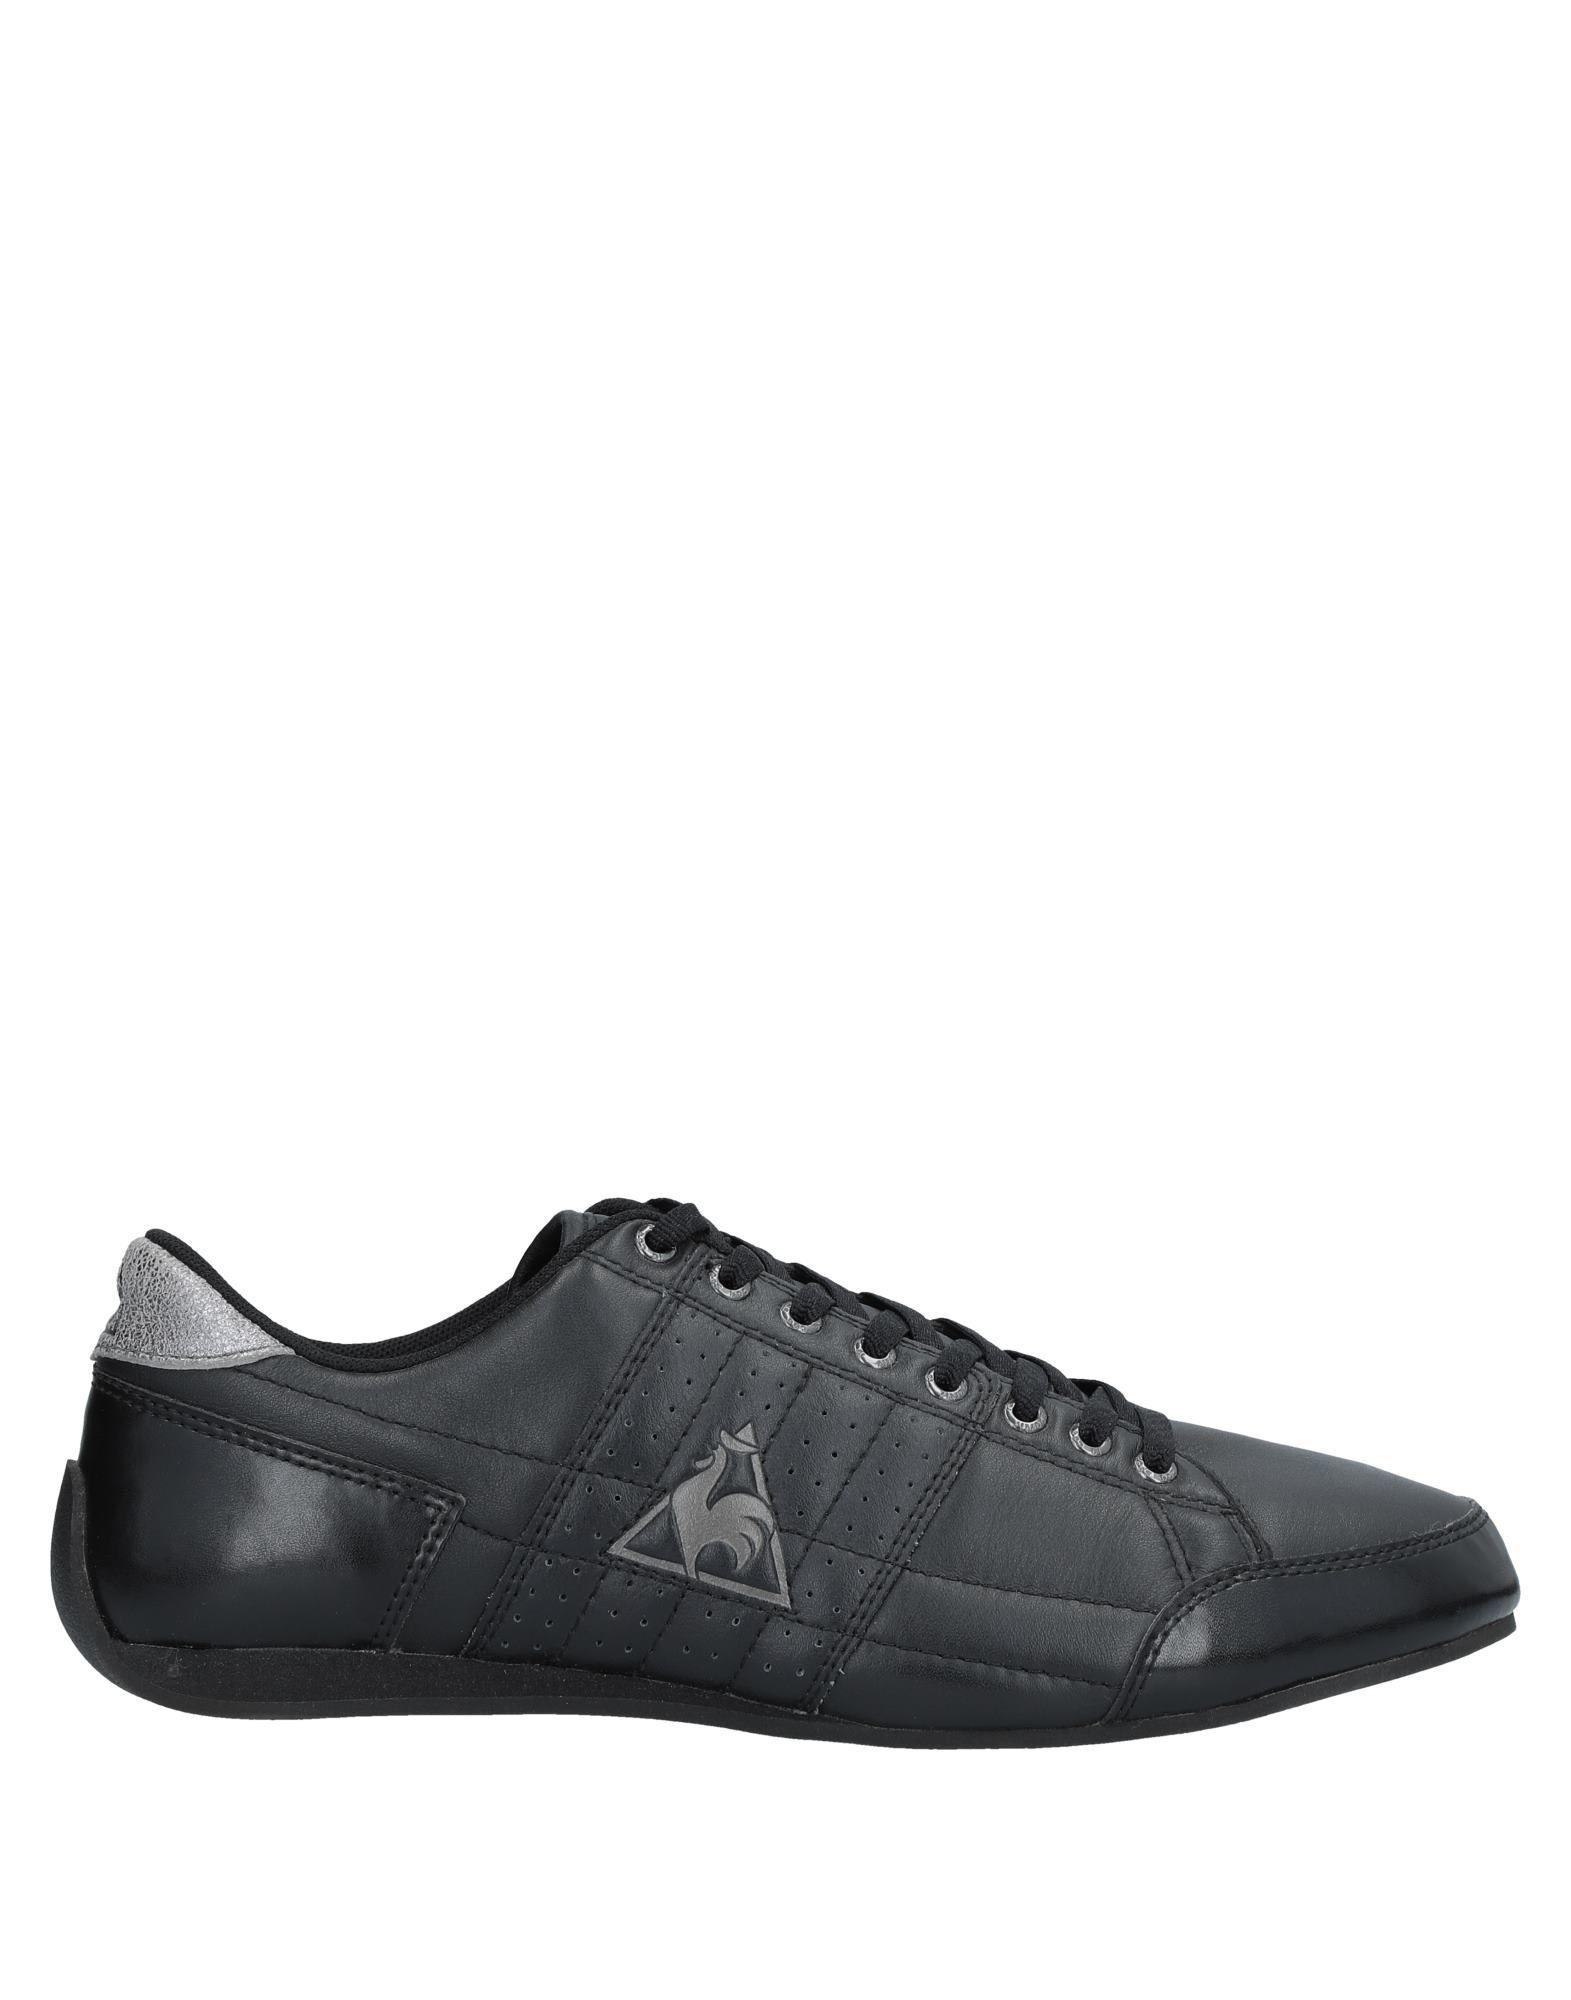 Sneakers Le Coq Sportif Donna - 11539139TU